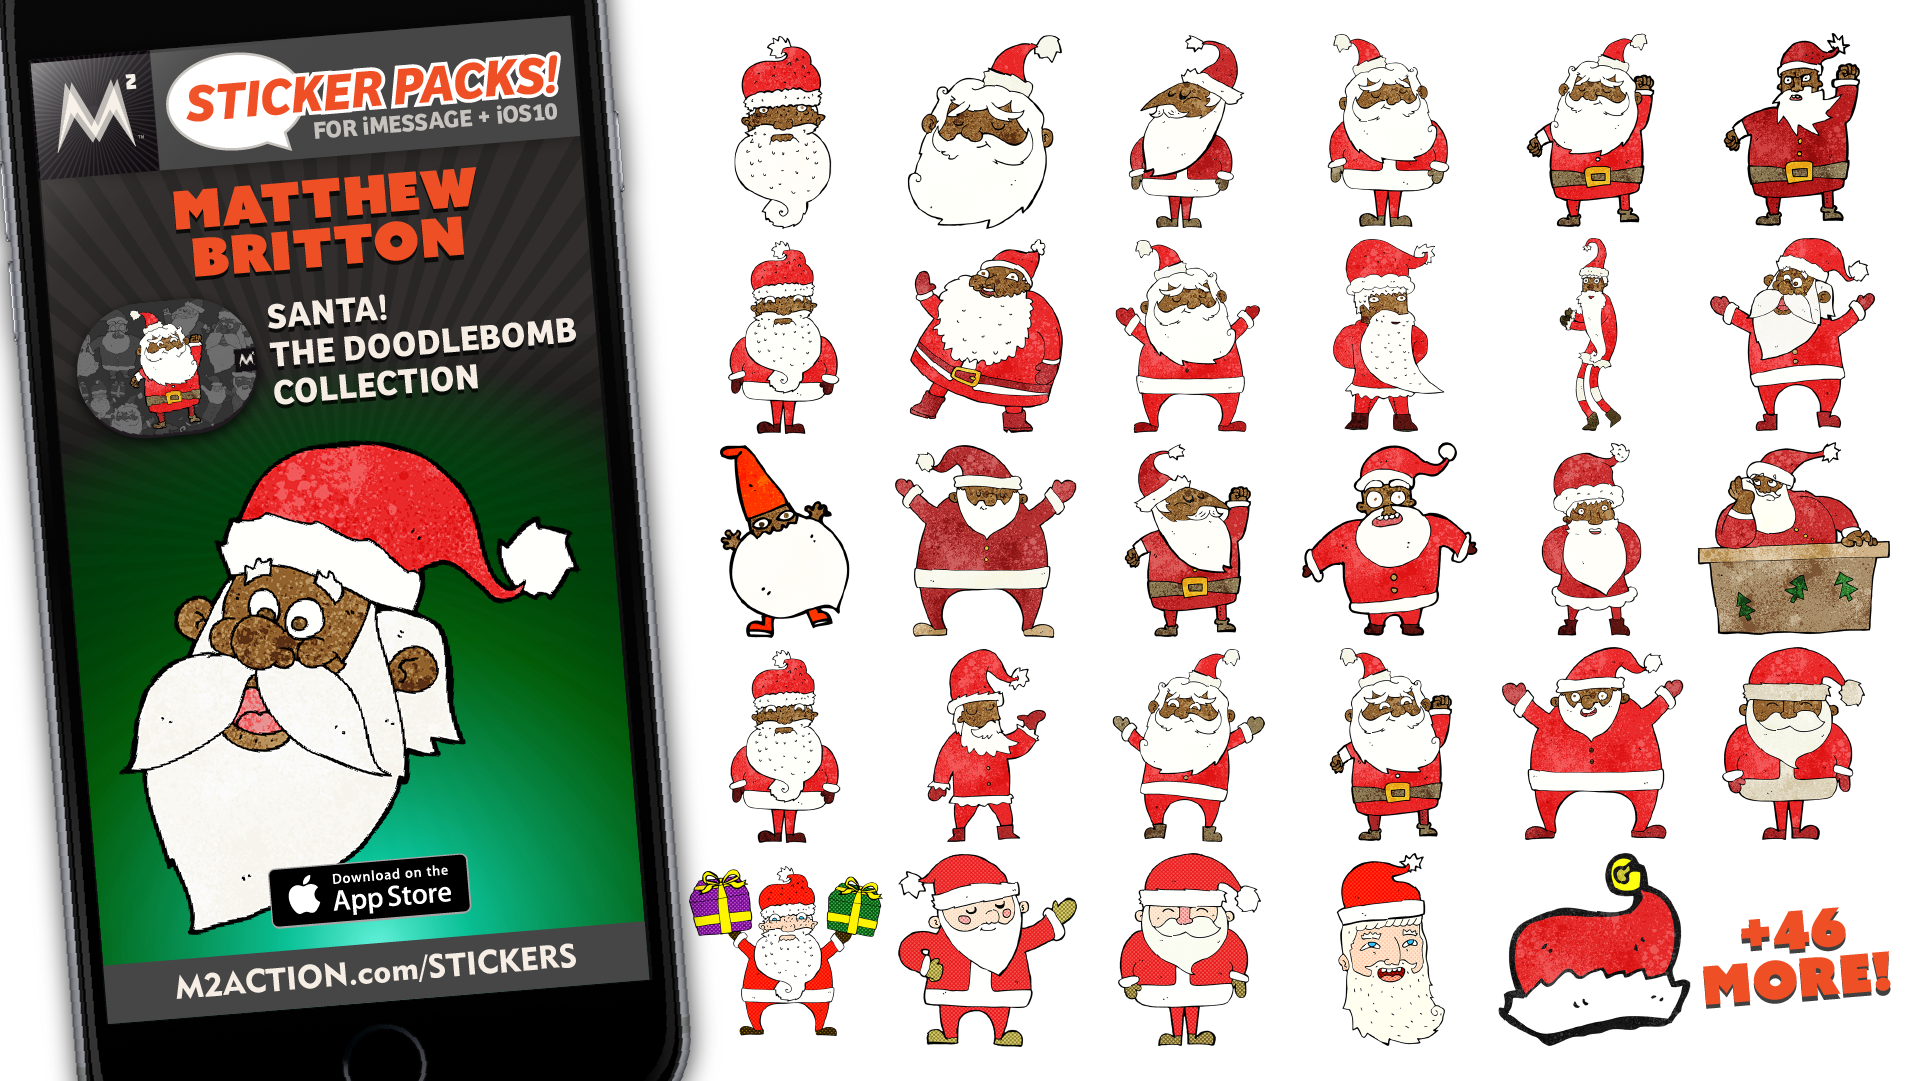 M2_Stickers_Promos_Dec2016_MatthewBritton_DoodleBomb_Santa.png